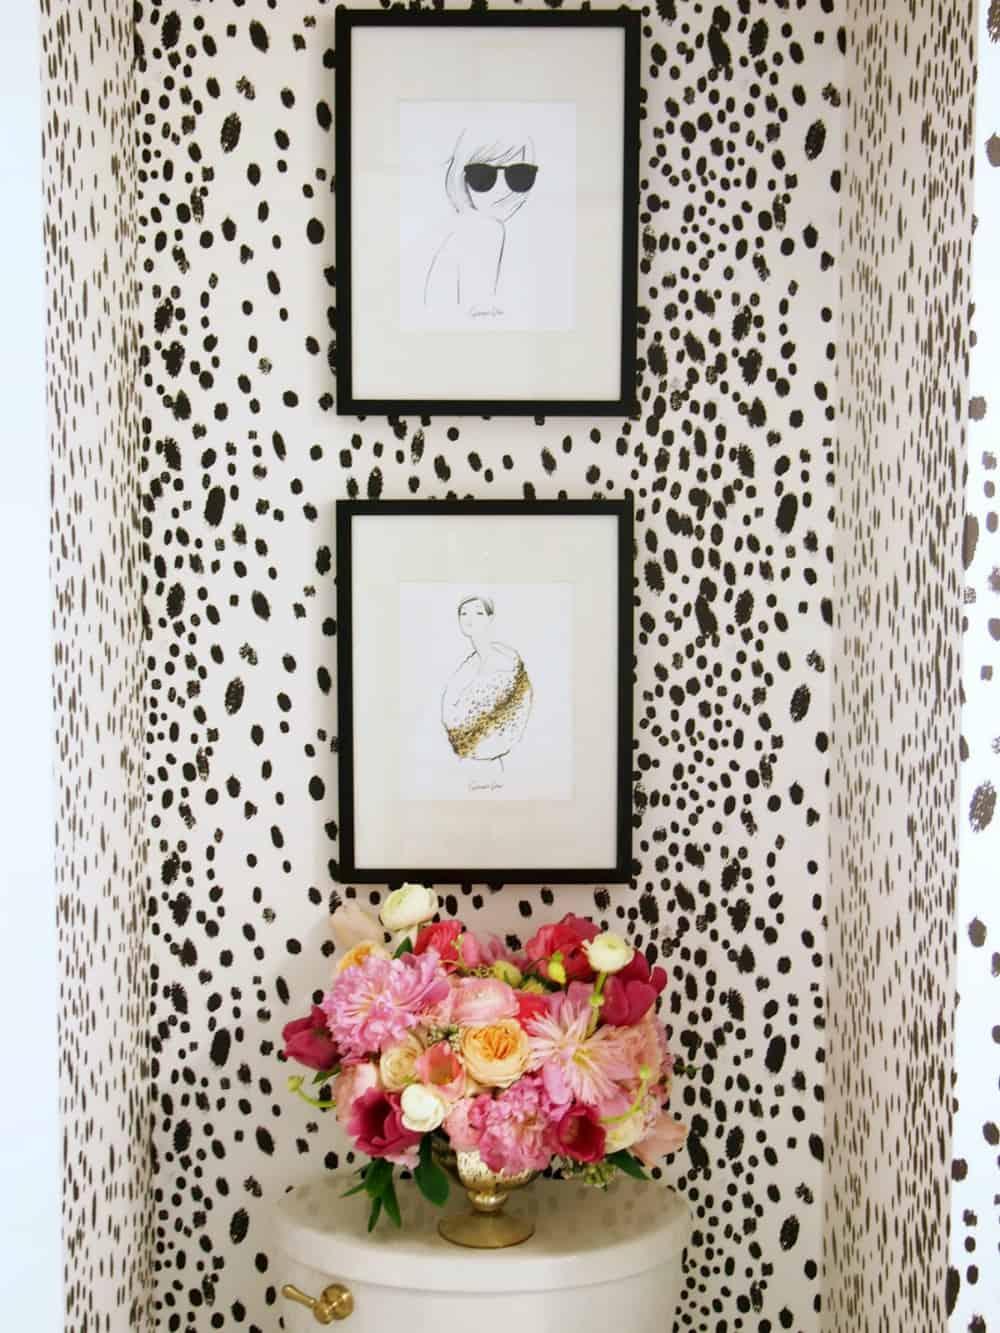 Dalmatian powder room